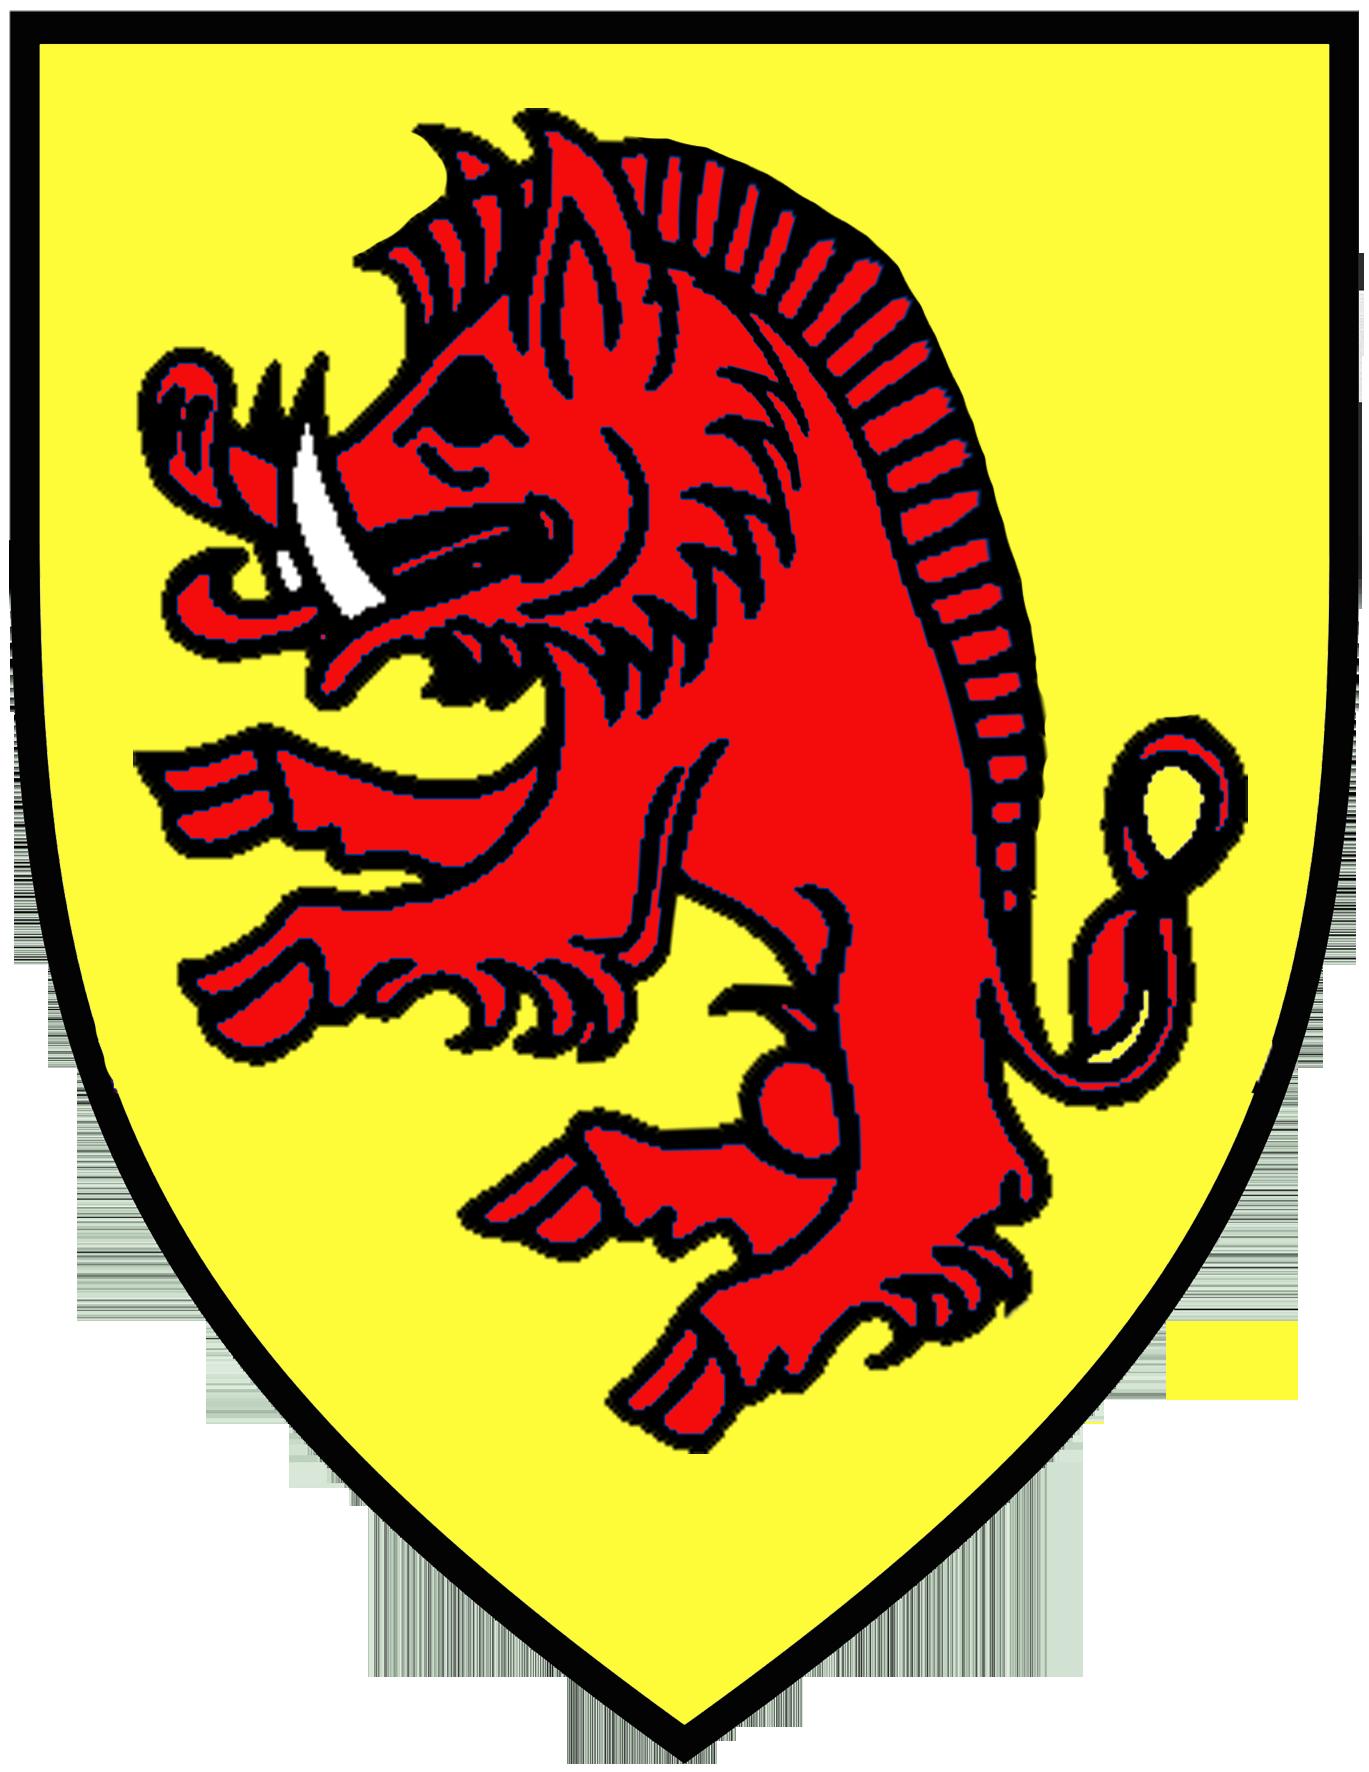 Wappen des Hauses Schweinsfold, (c) DanSch